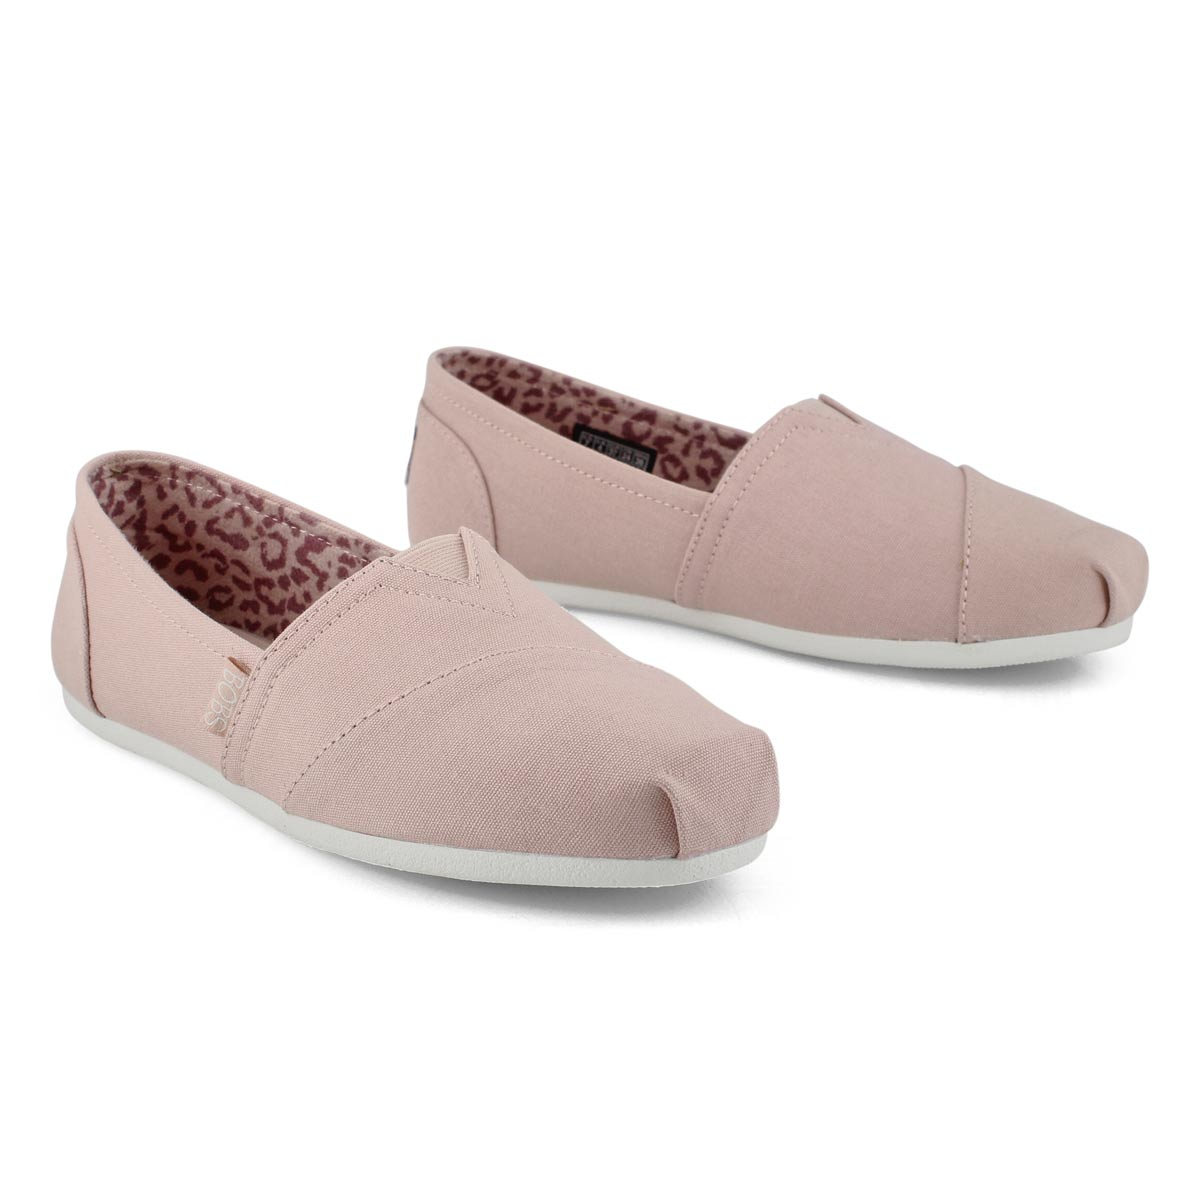 Women's Bobs Plush Peace & Love Shoe -Blush